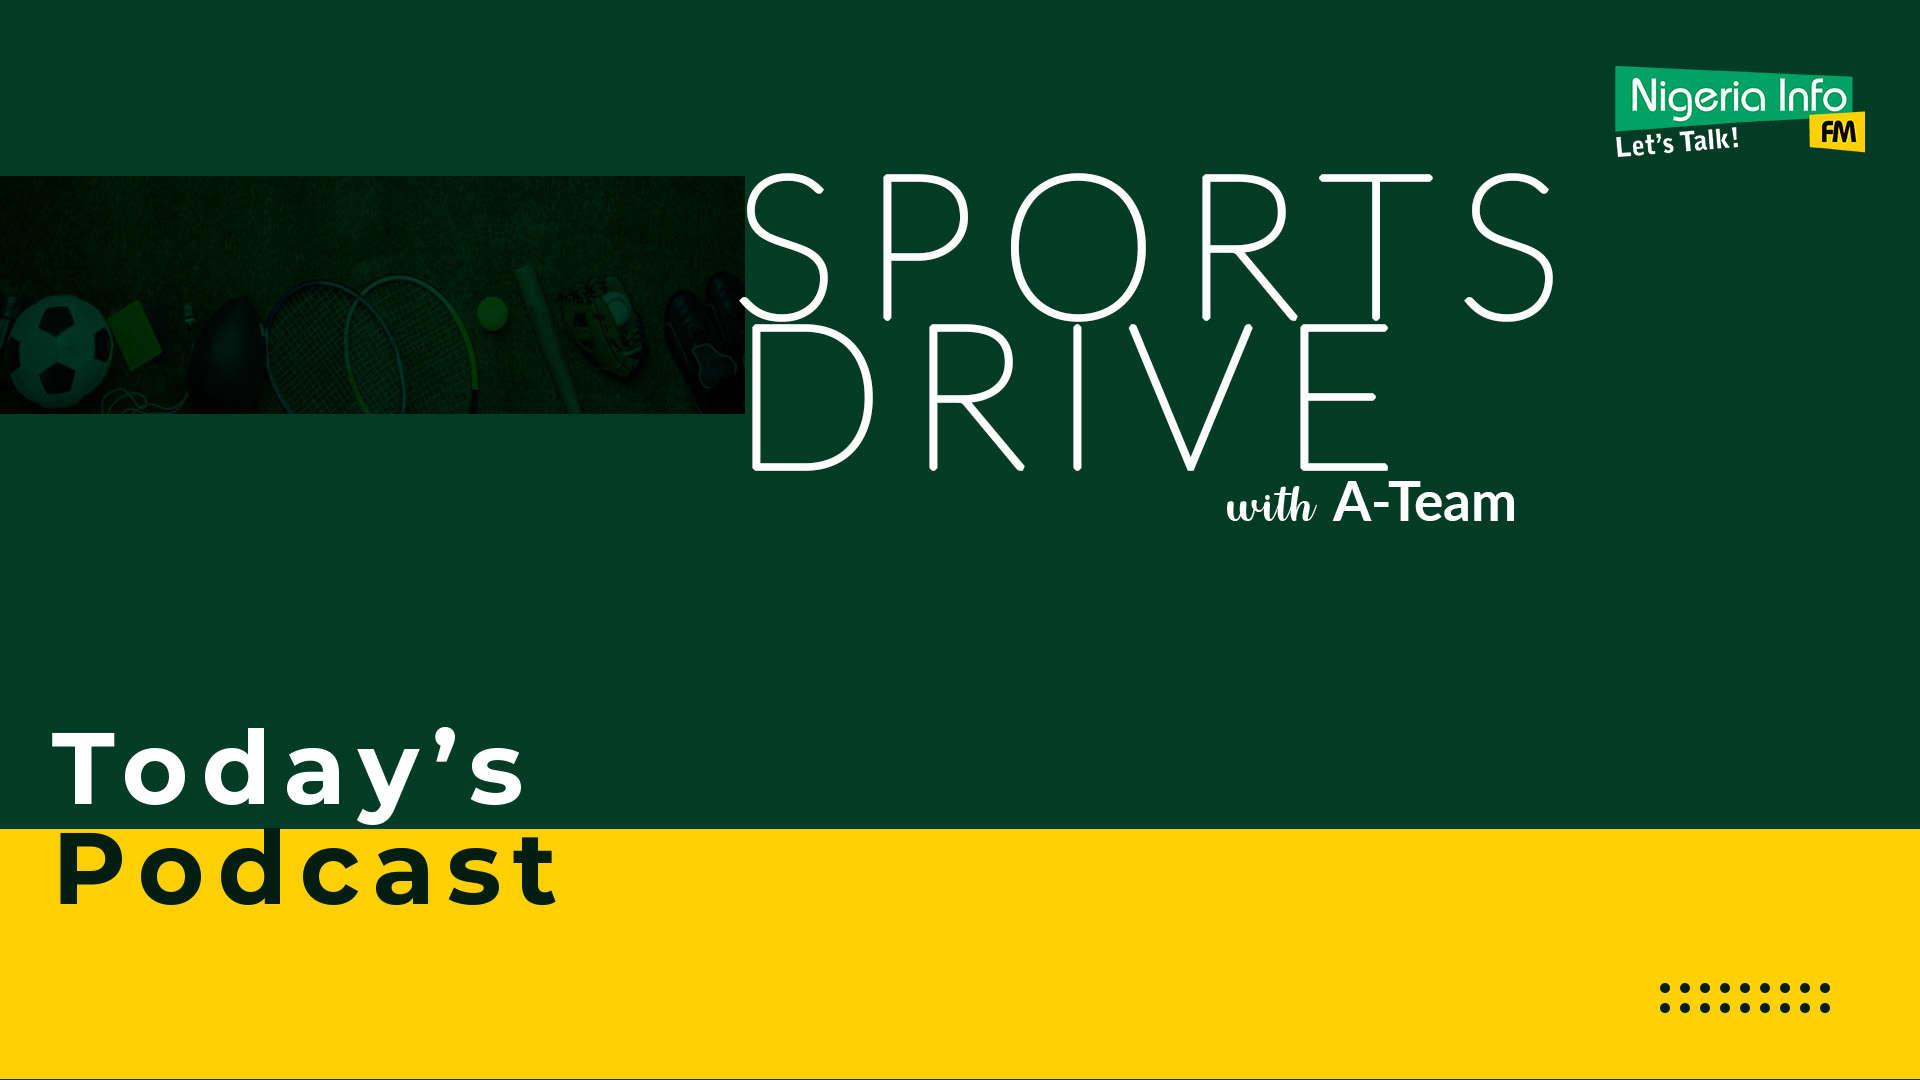 Sports Drive Abuja